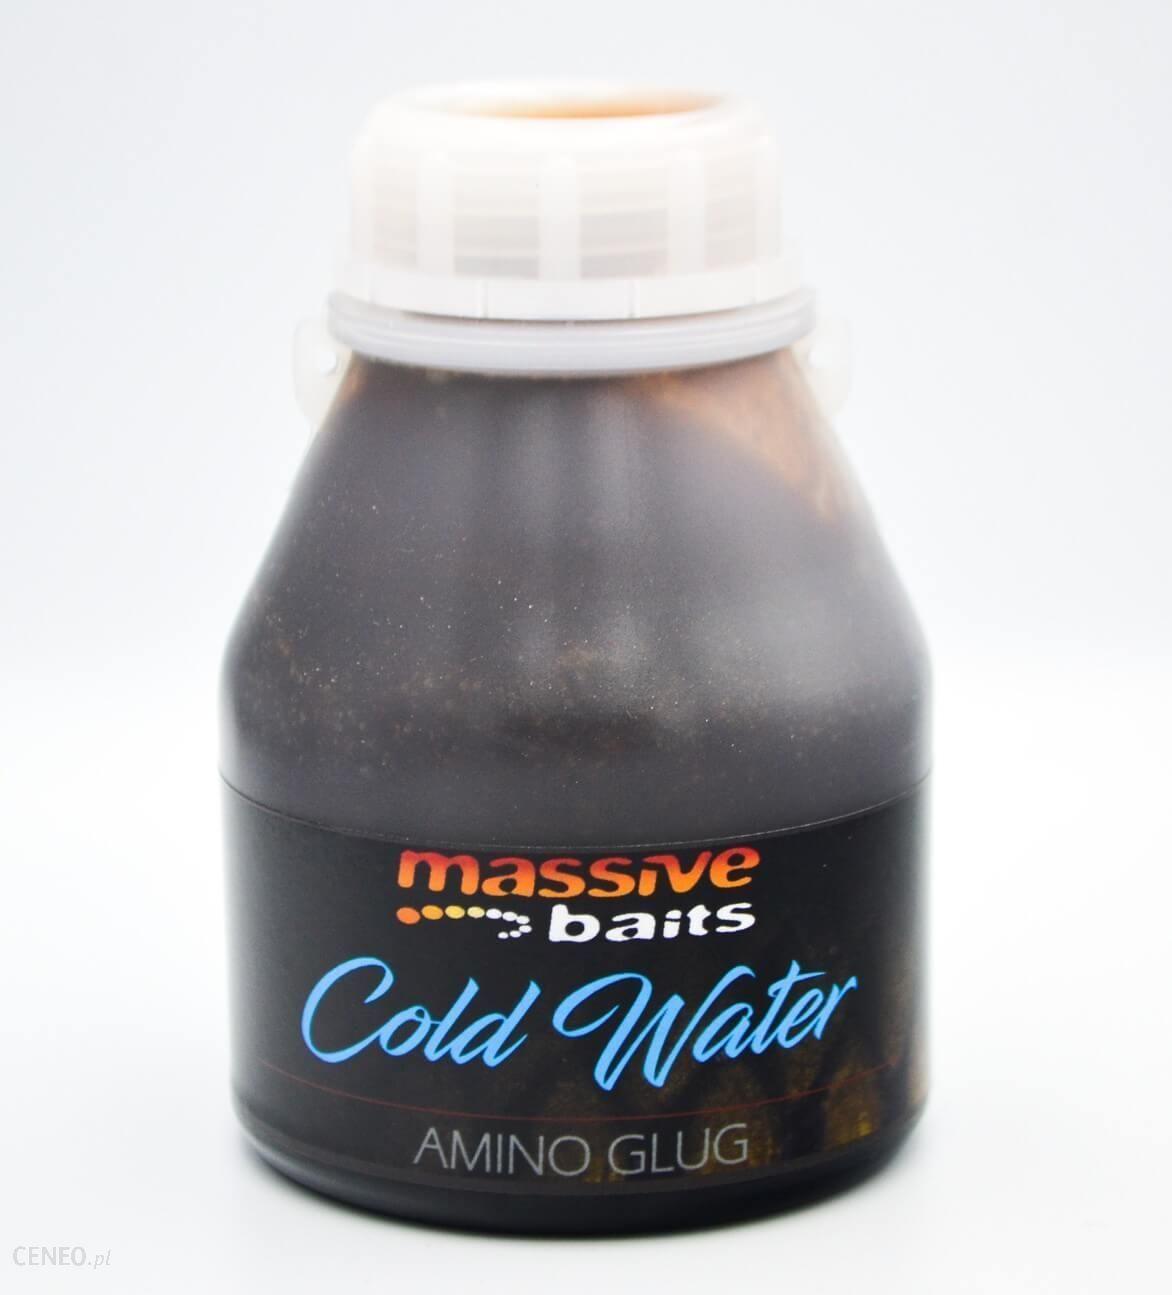 Massive Baits Special Amino Glug Cold Water 250Ml